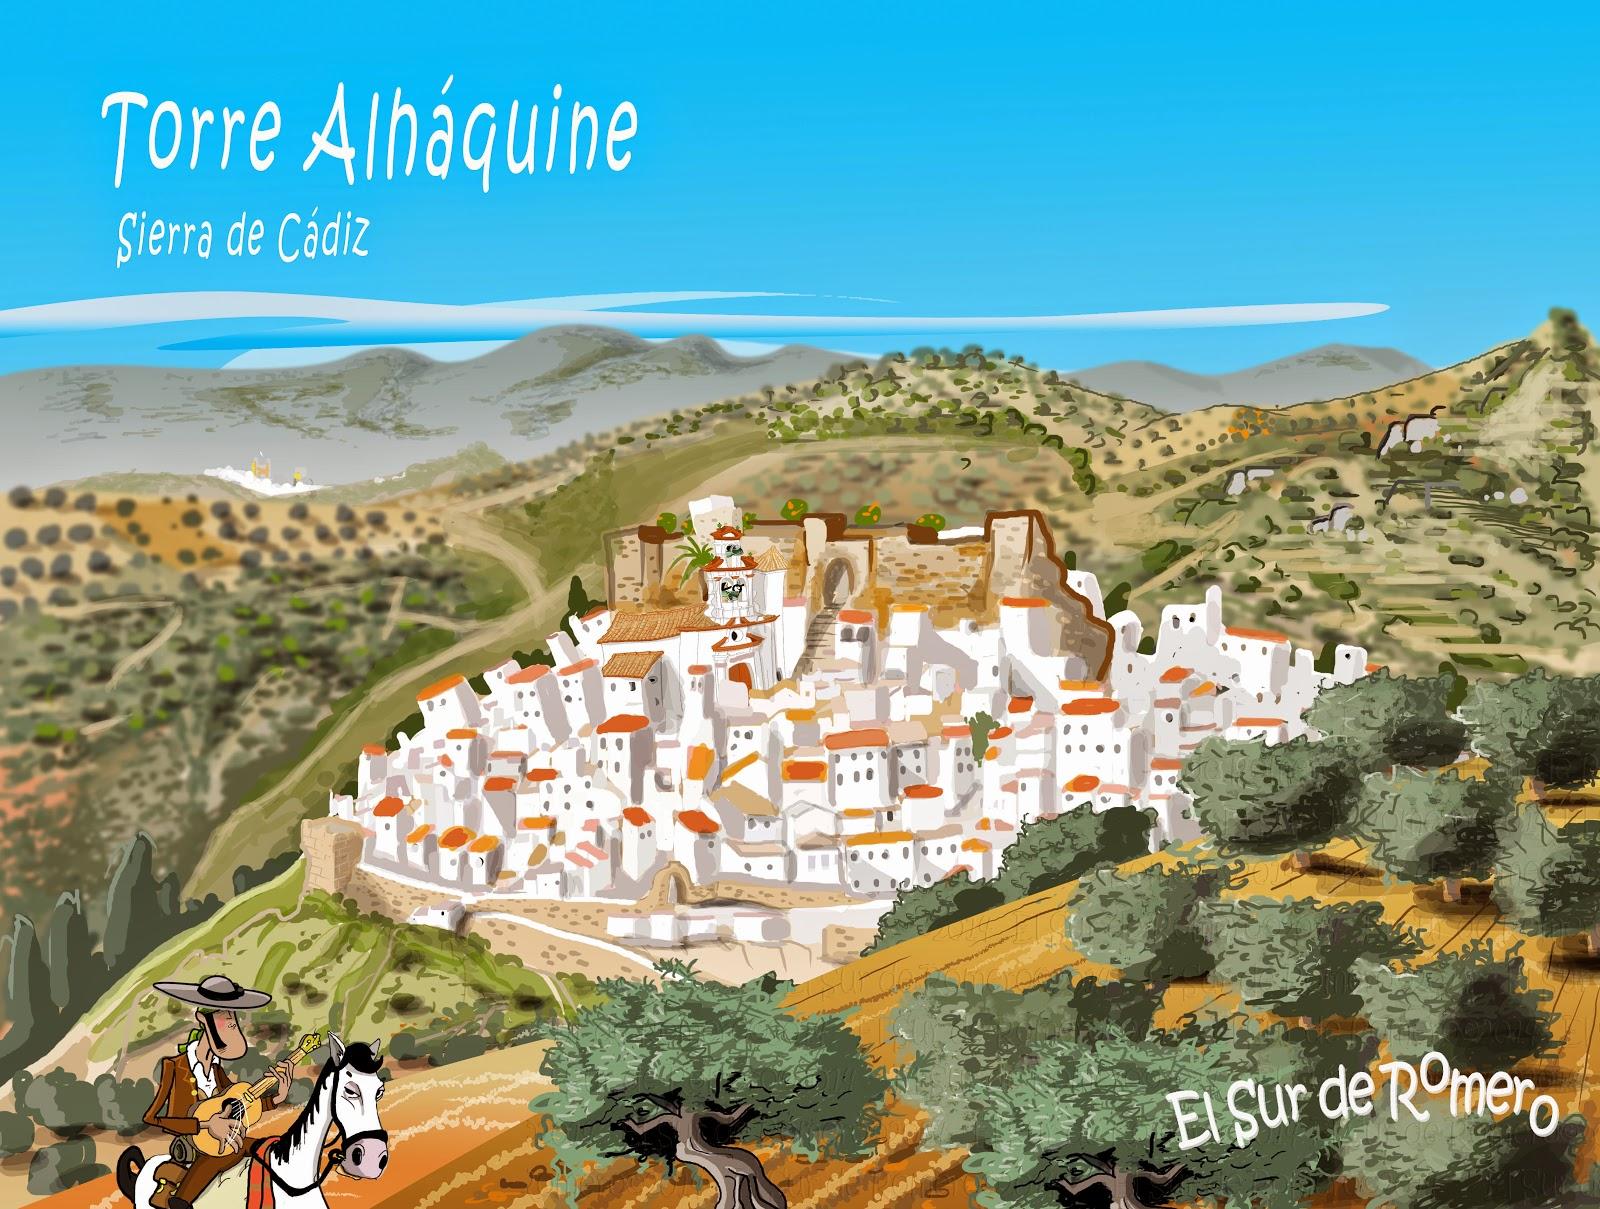 "<img src=""Torre Alháquine.jpg"" alt=""dibujo de Sierra de Cádiz""/>"